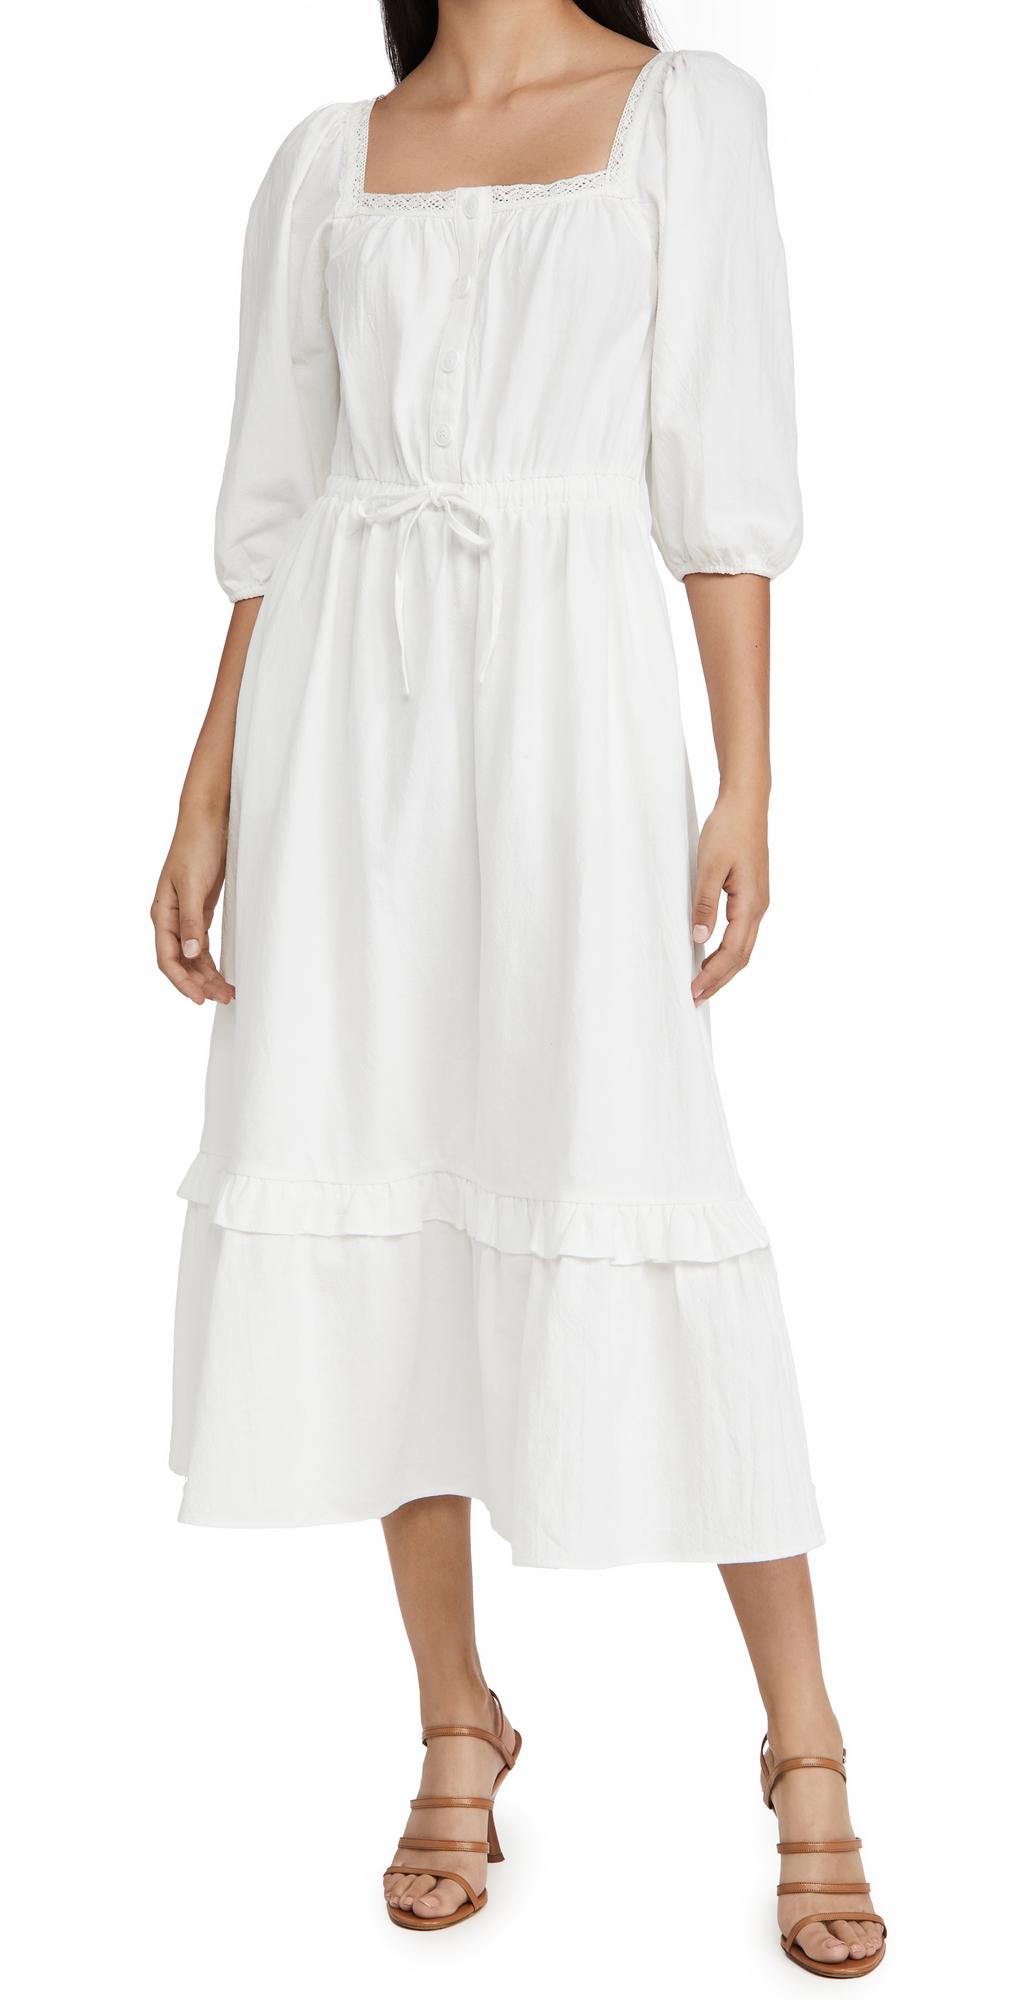 Francee Dress